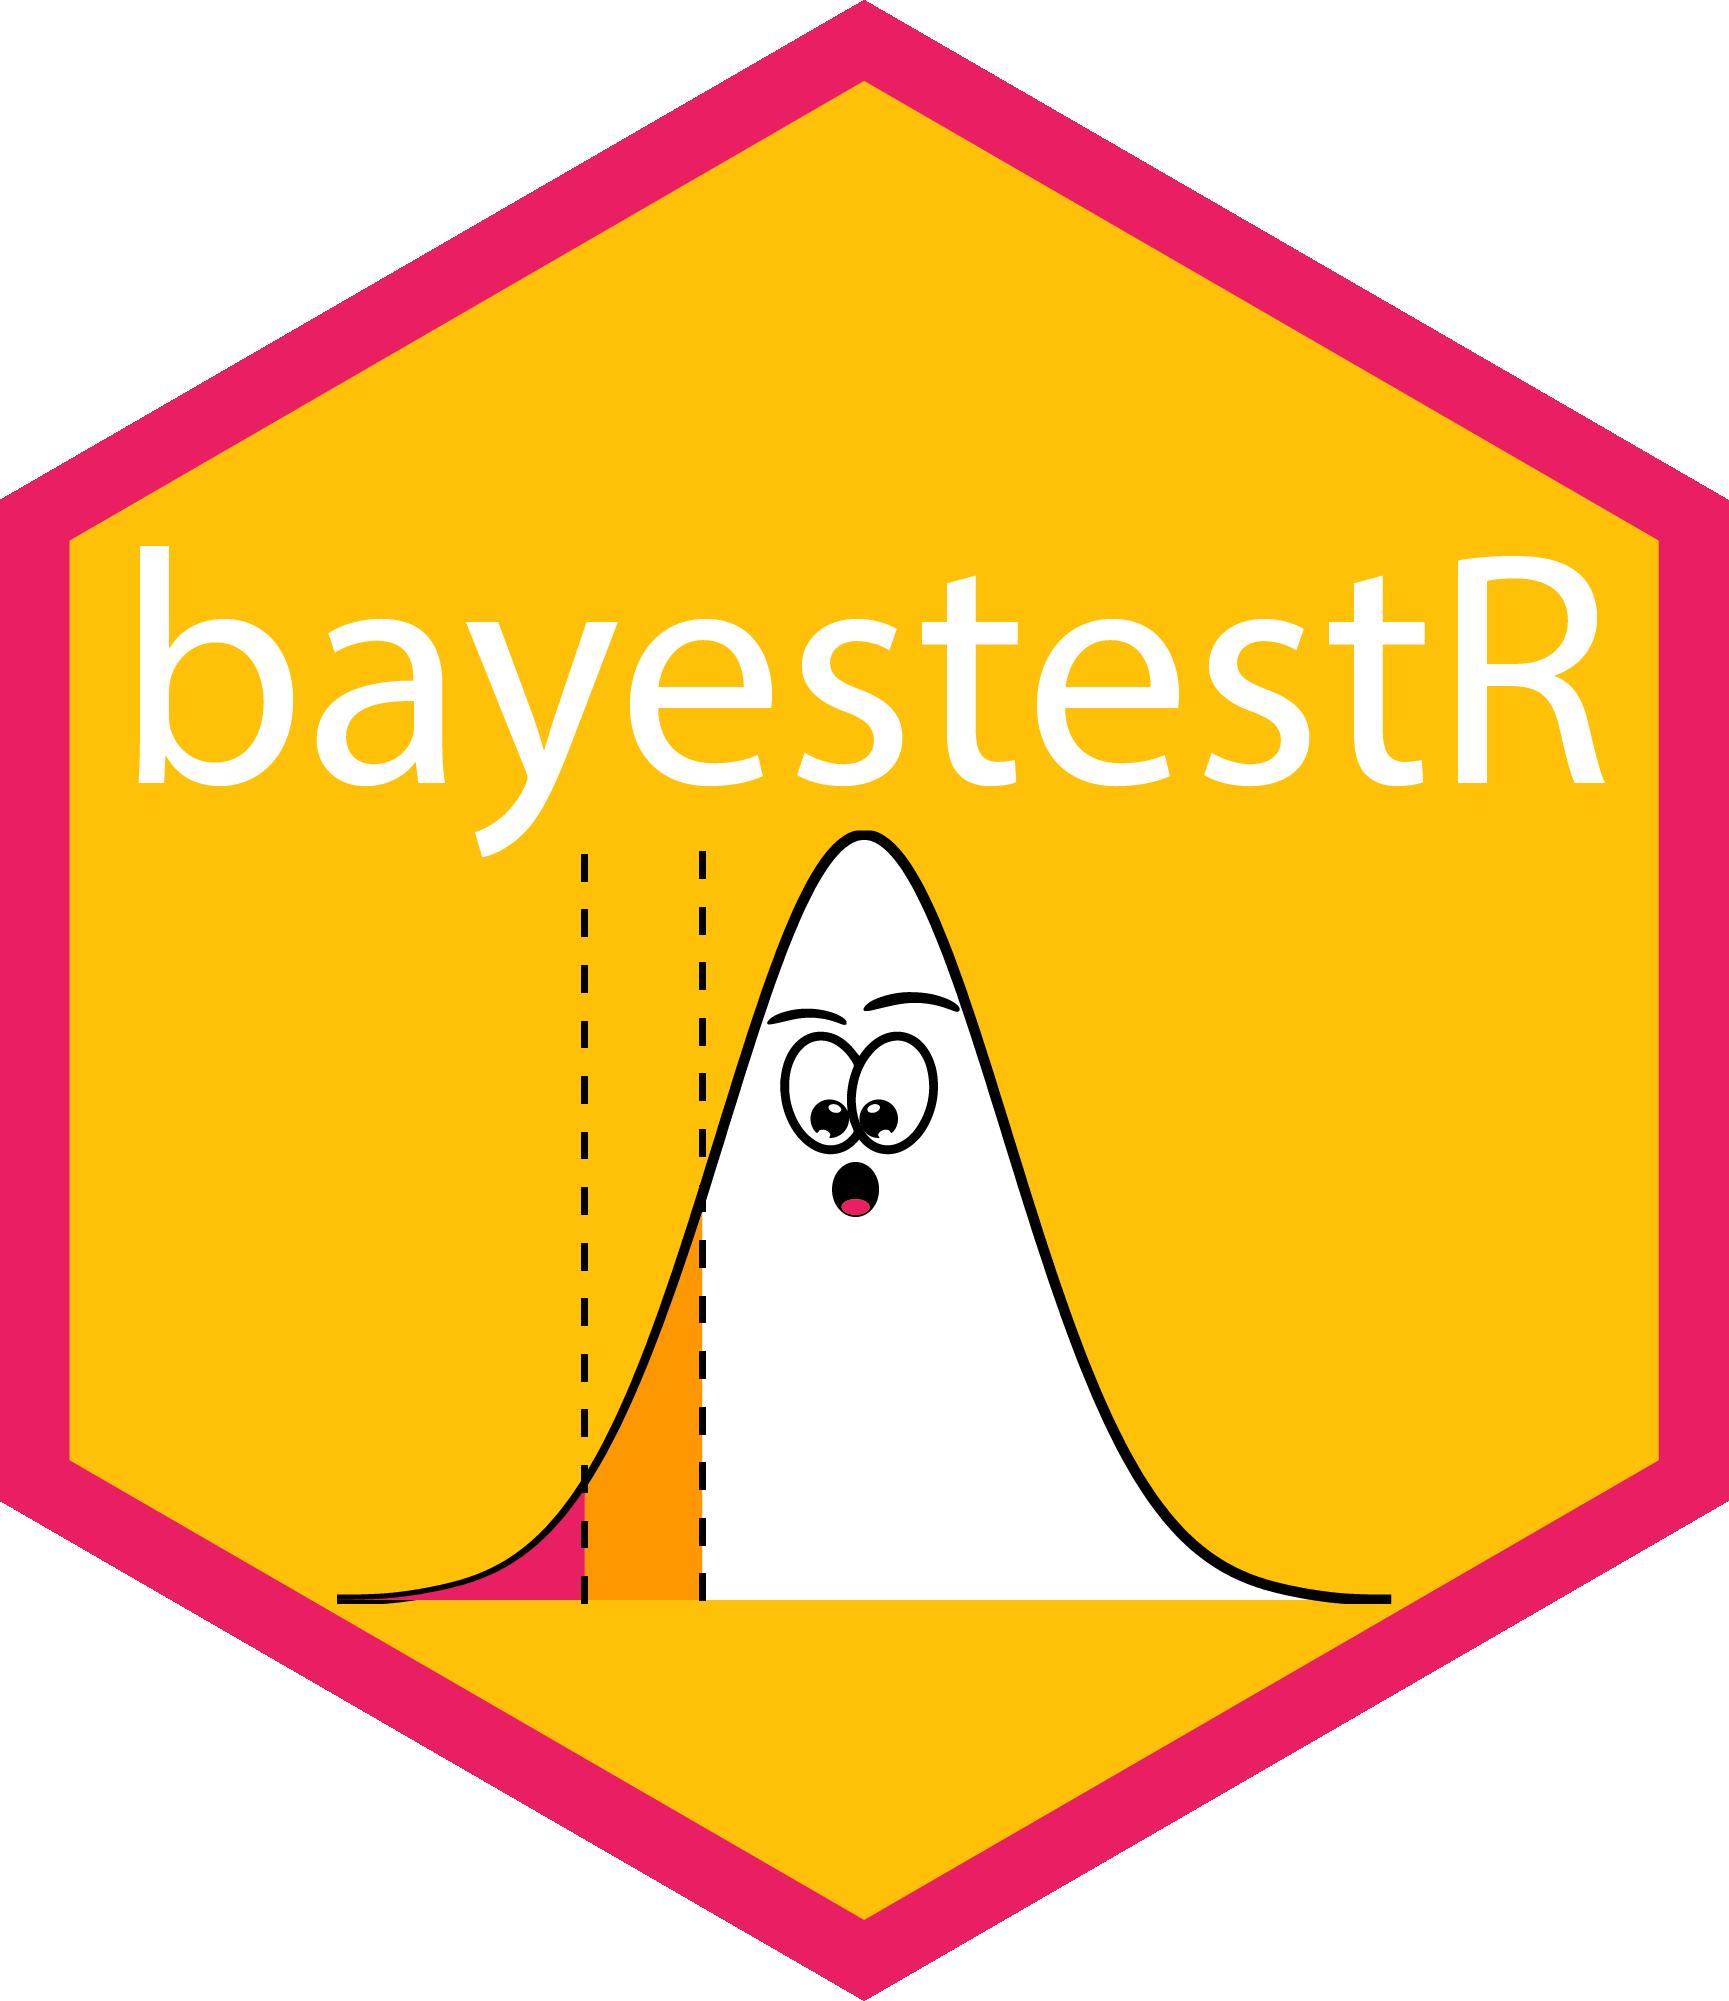 r-cran-bayestestr avatar